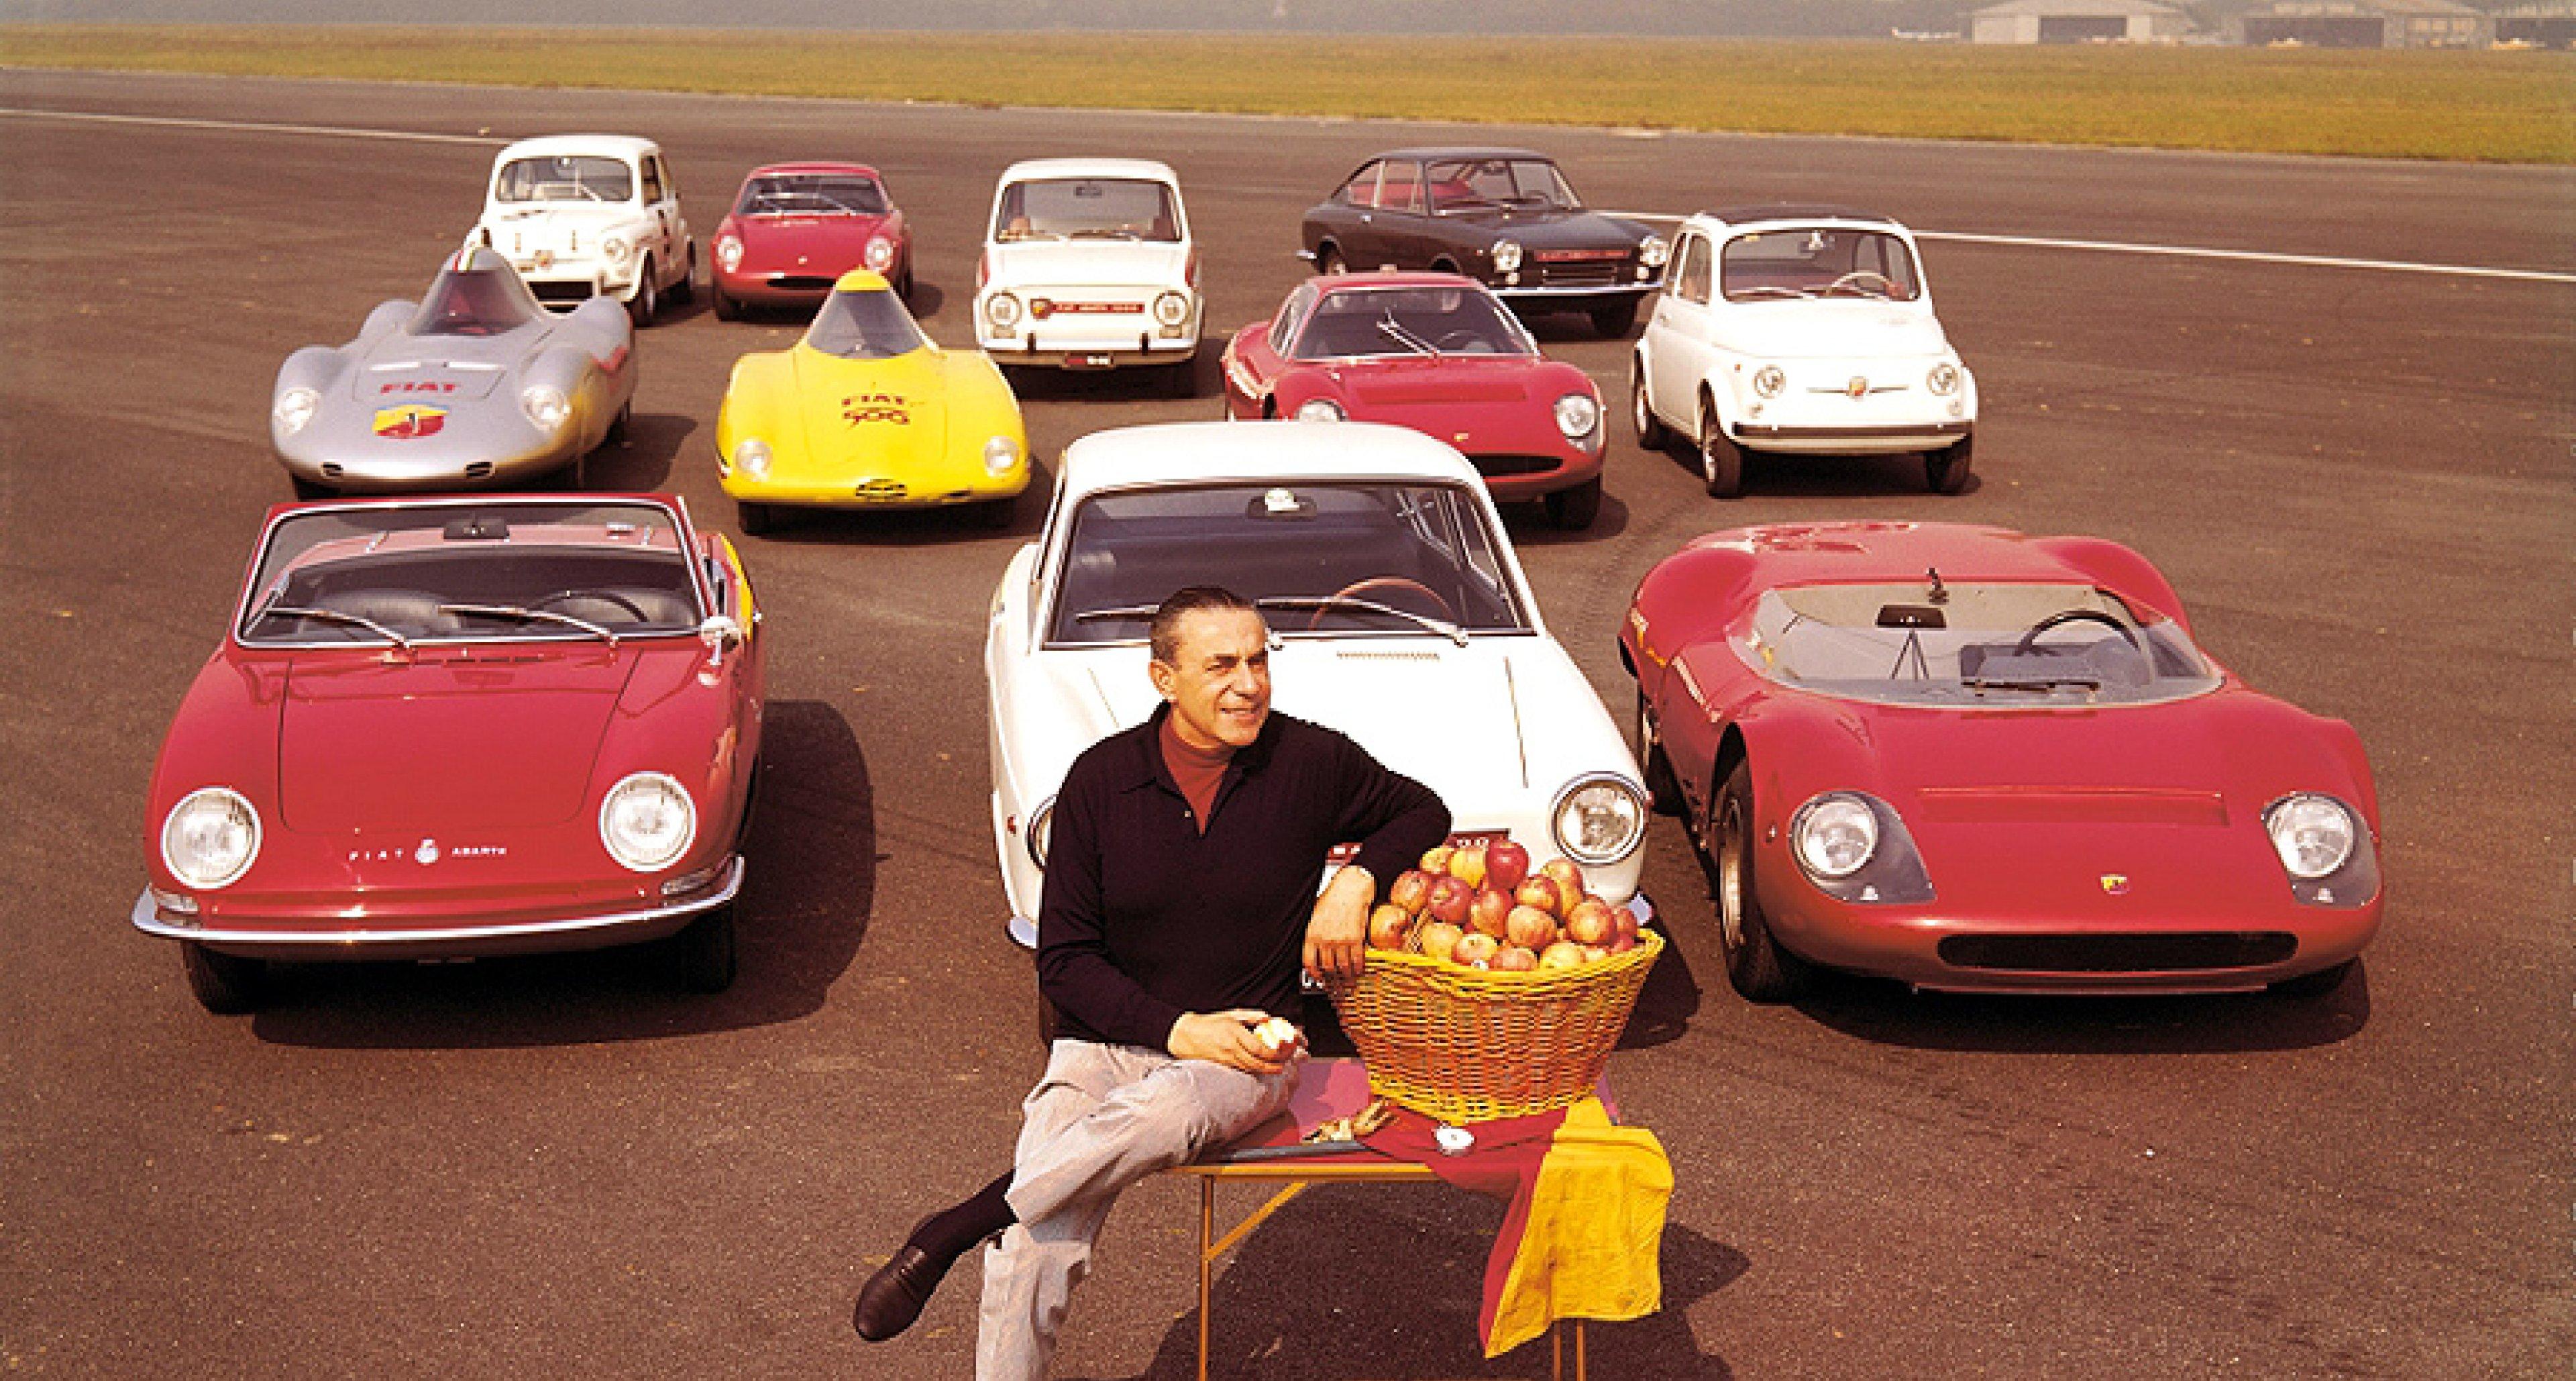 Abarth planning new sports car